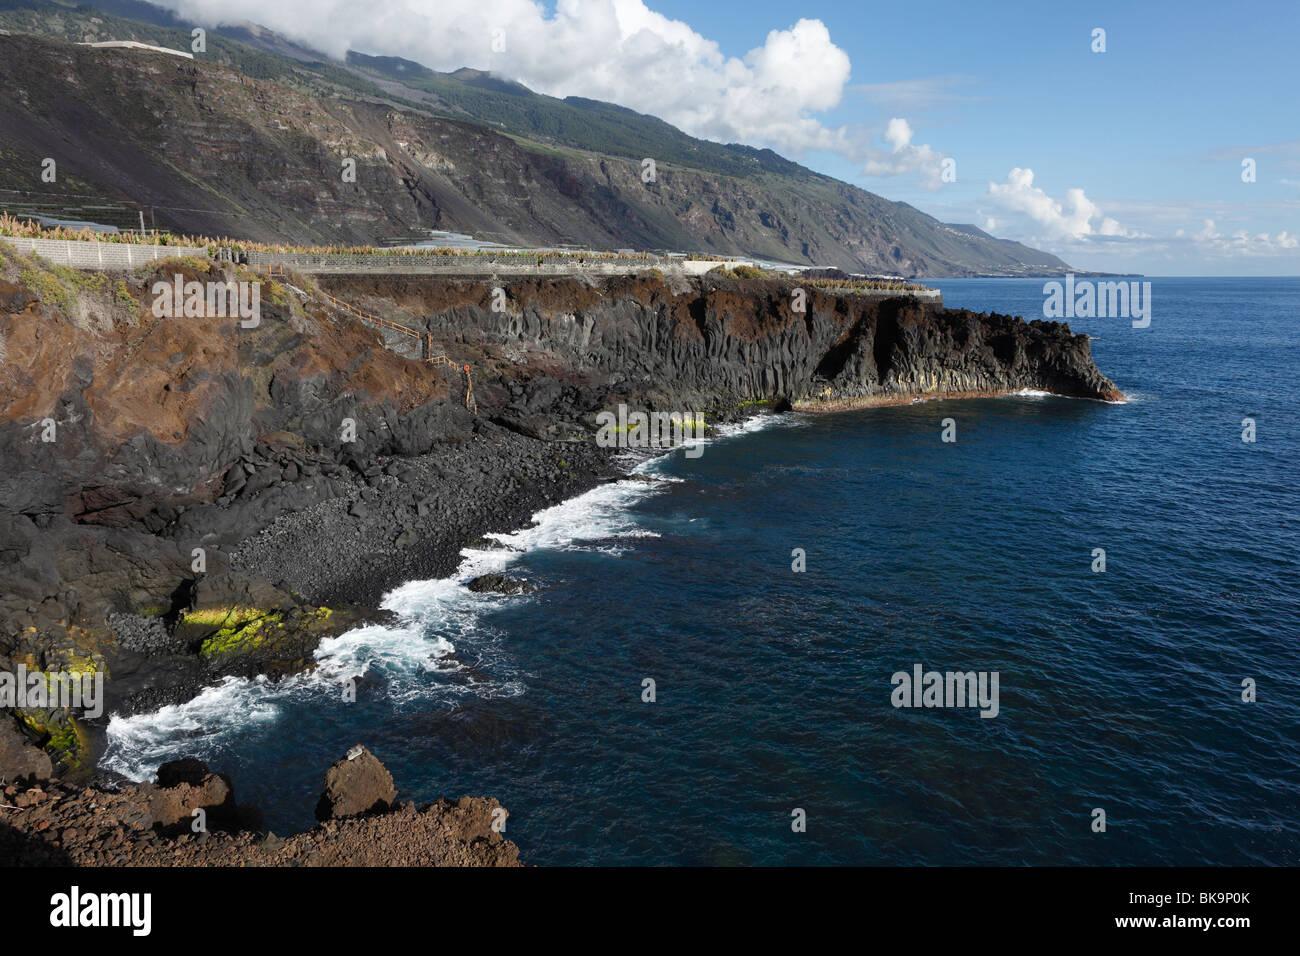 Playa las Monjas near Puerto Naos, La Palma, Canary Islands, Spain - Stock Image